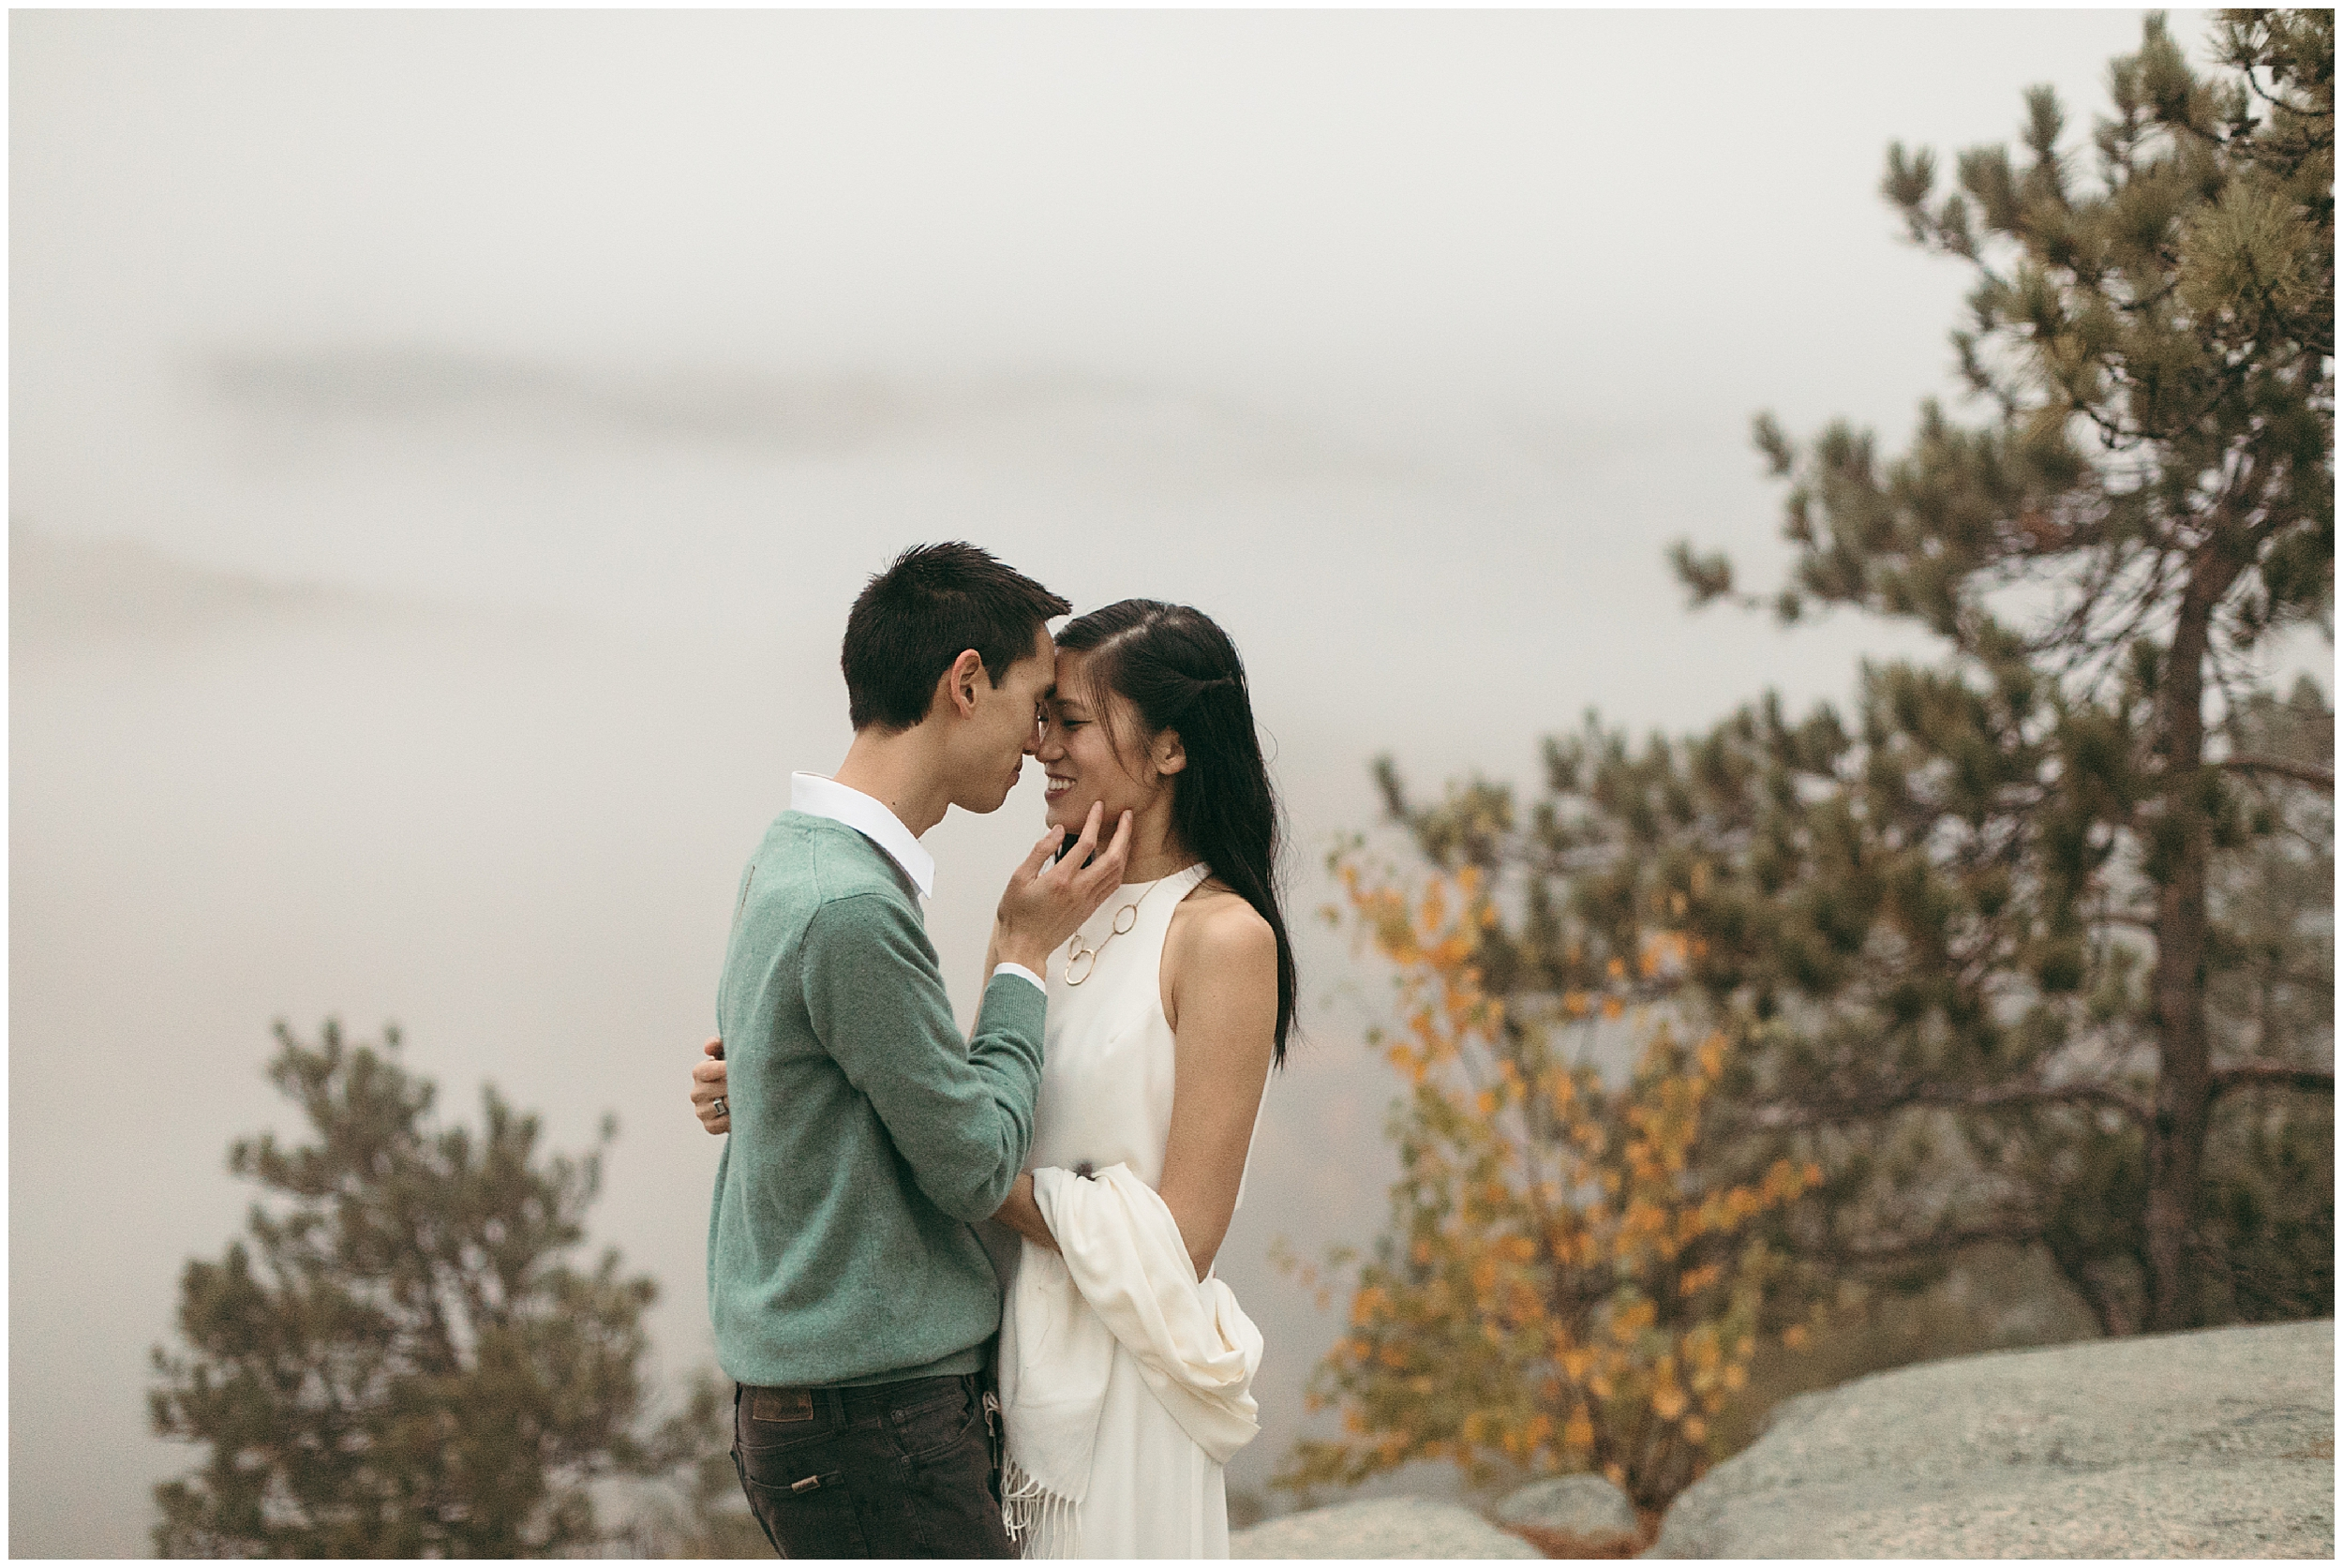 White-Mountains-Engagement-Bailey-Q-Photo-New-Hampshire-Wedding-Photographer-34.jpg